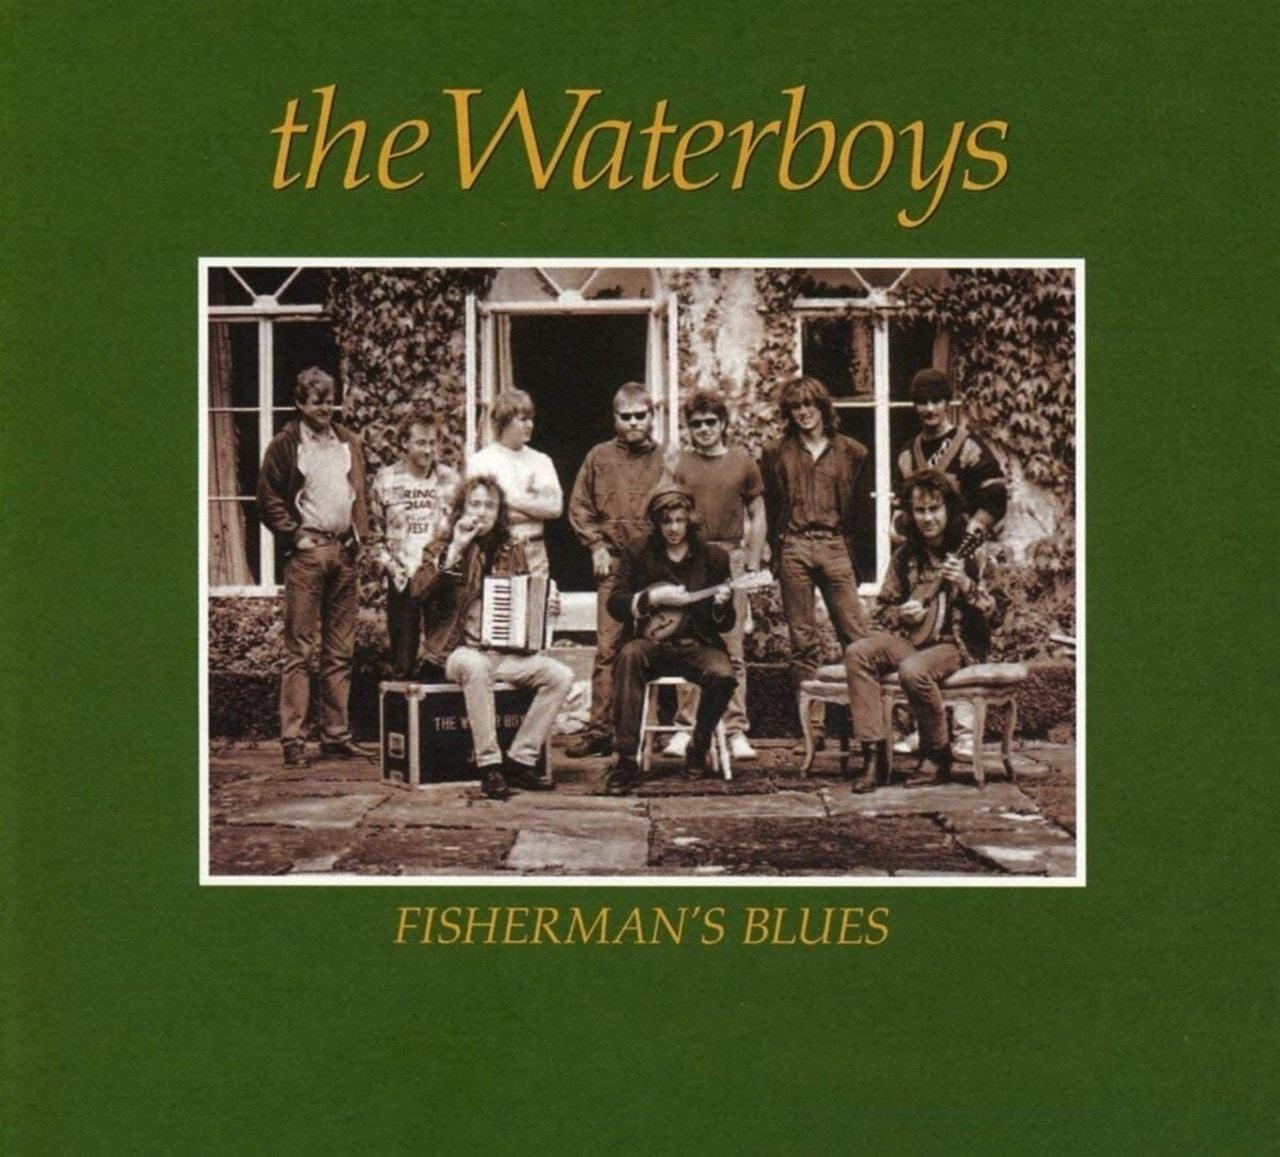 Fisherman's Blues - 1